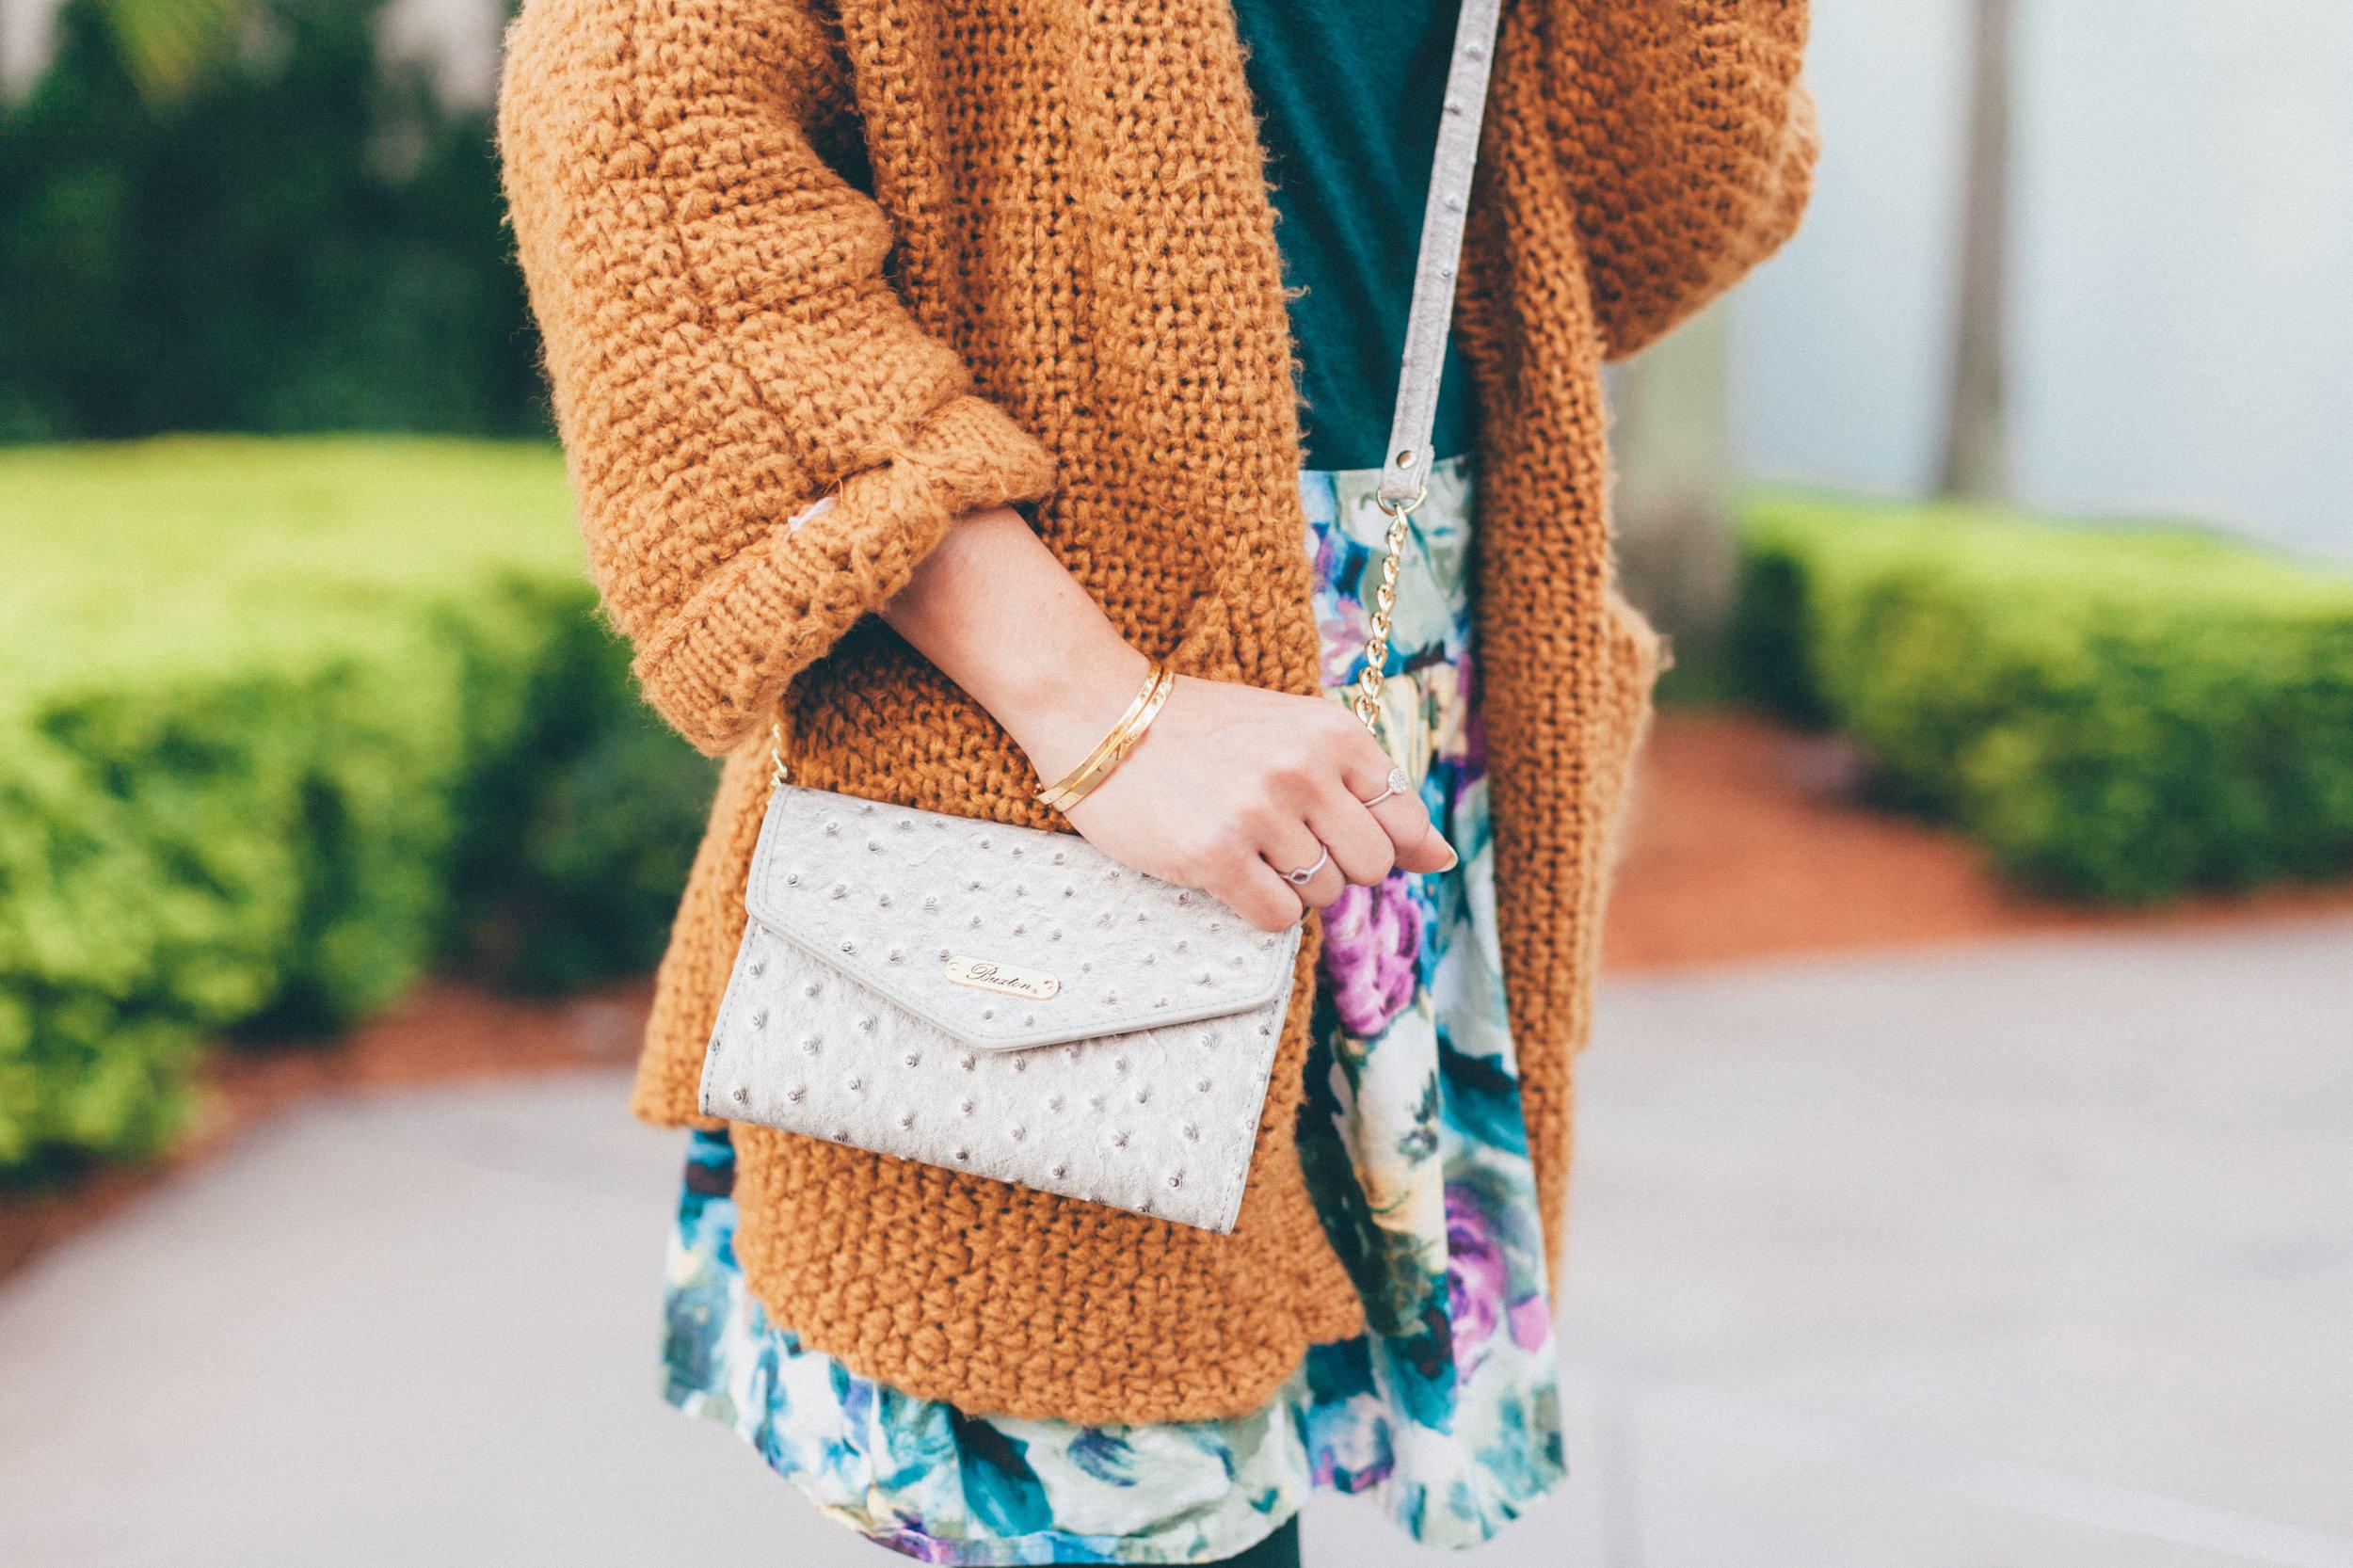 This Jenn Girl - Shein Sweater 3